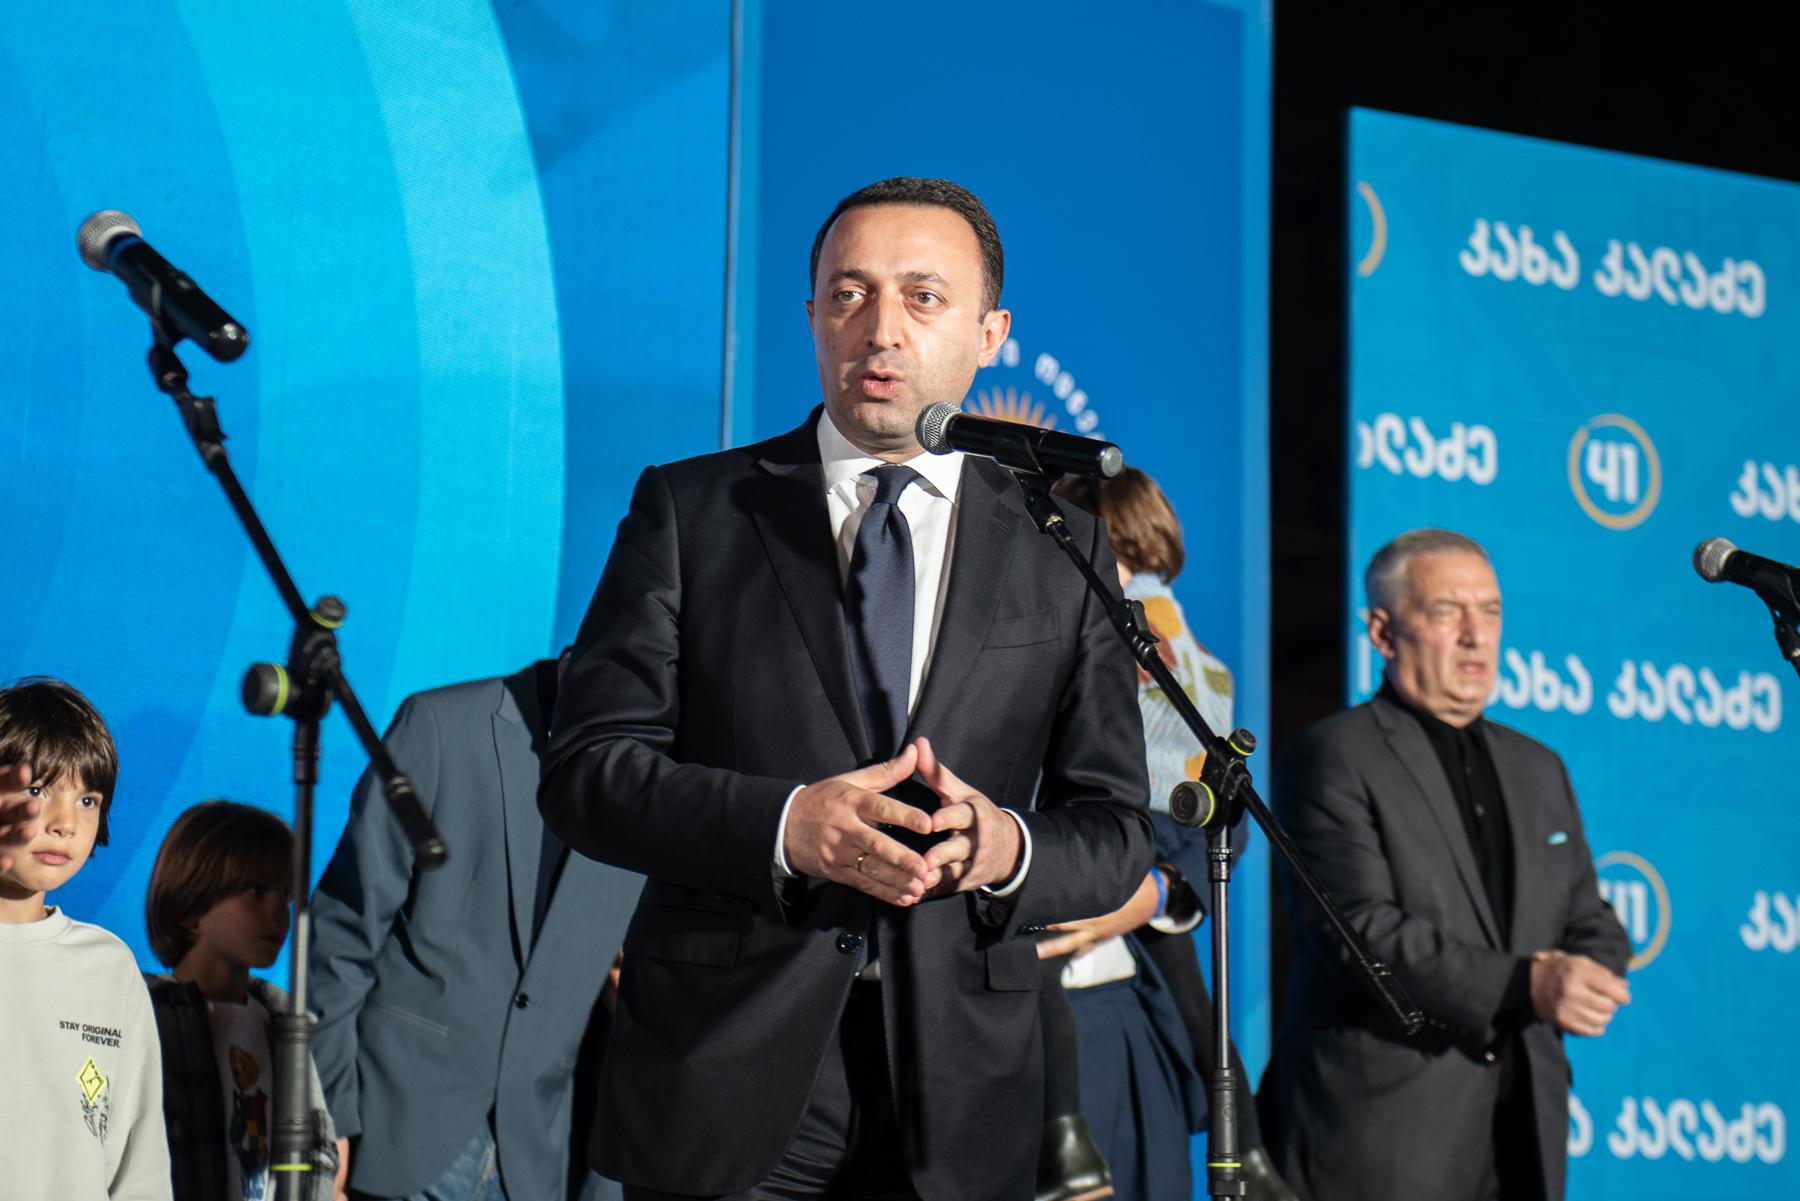 Irakli Gharibashvili. Photo:Mariam Nikuradze/OCMedia.